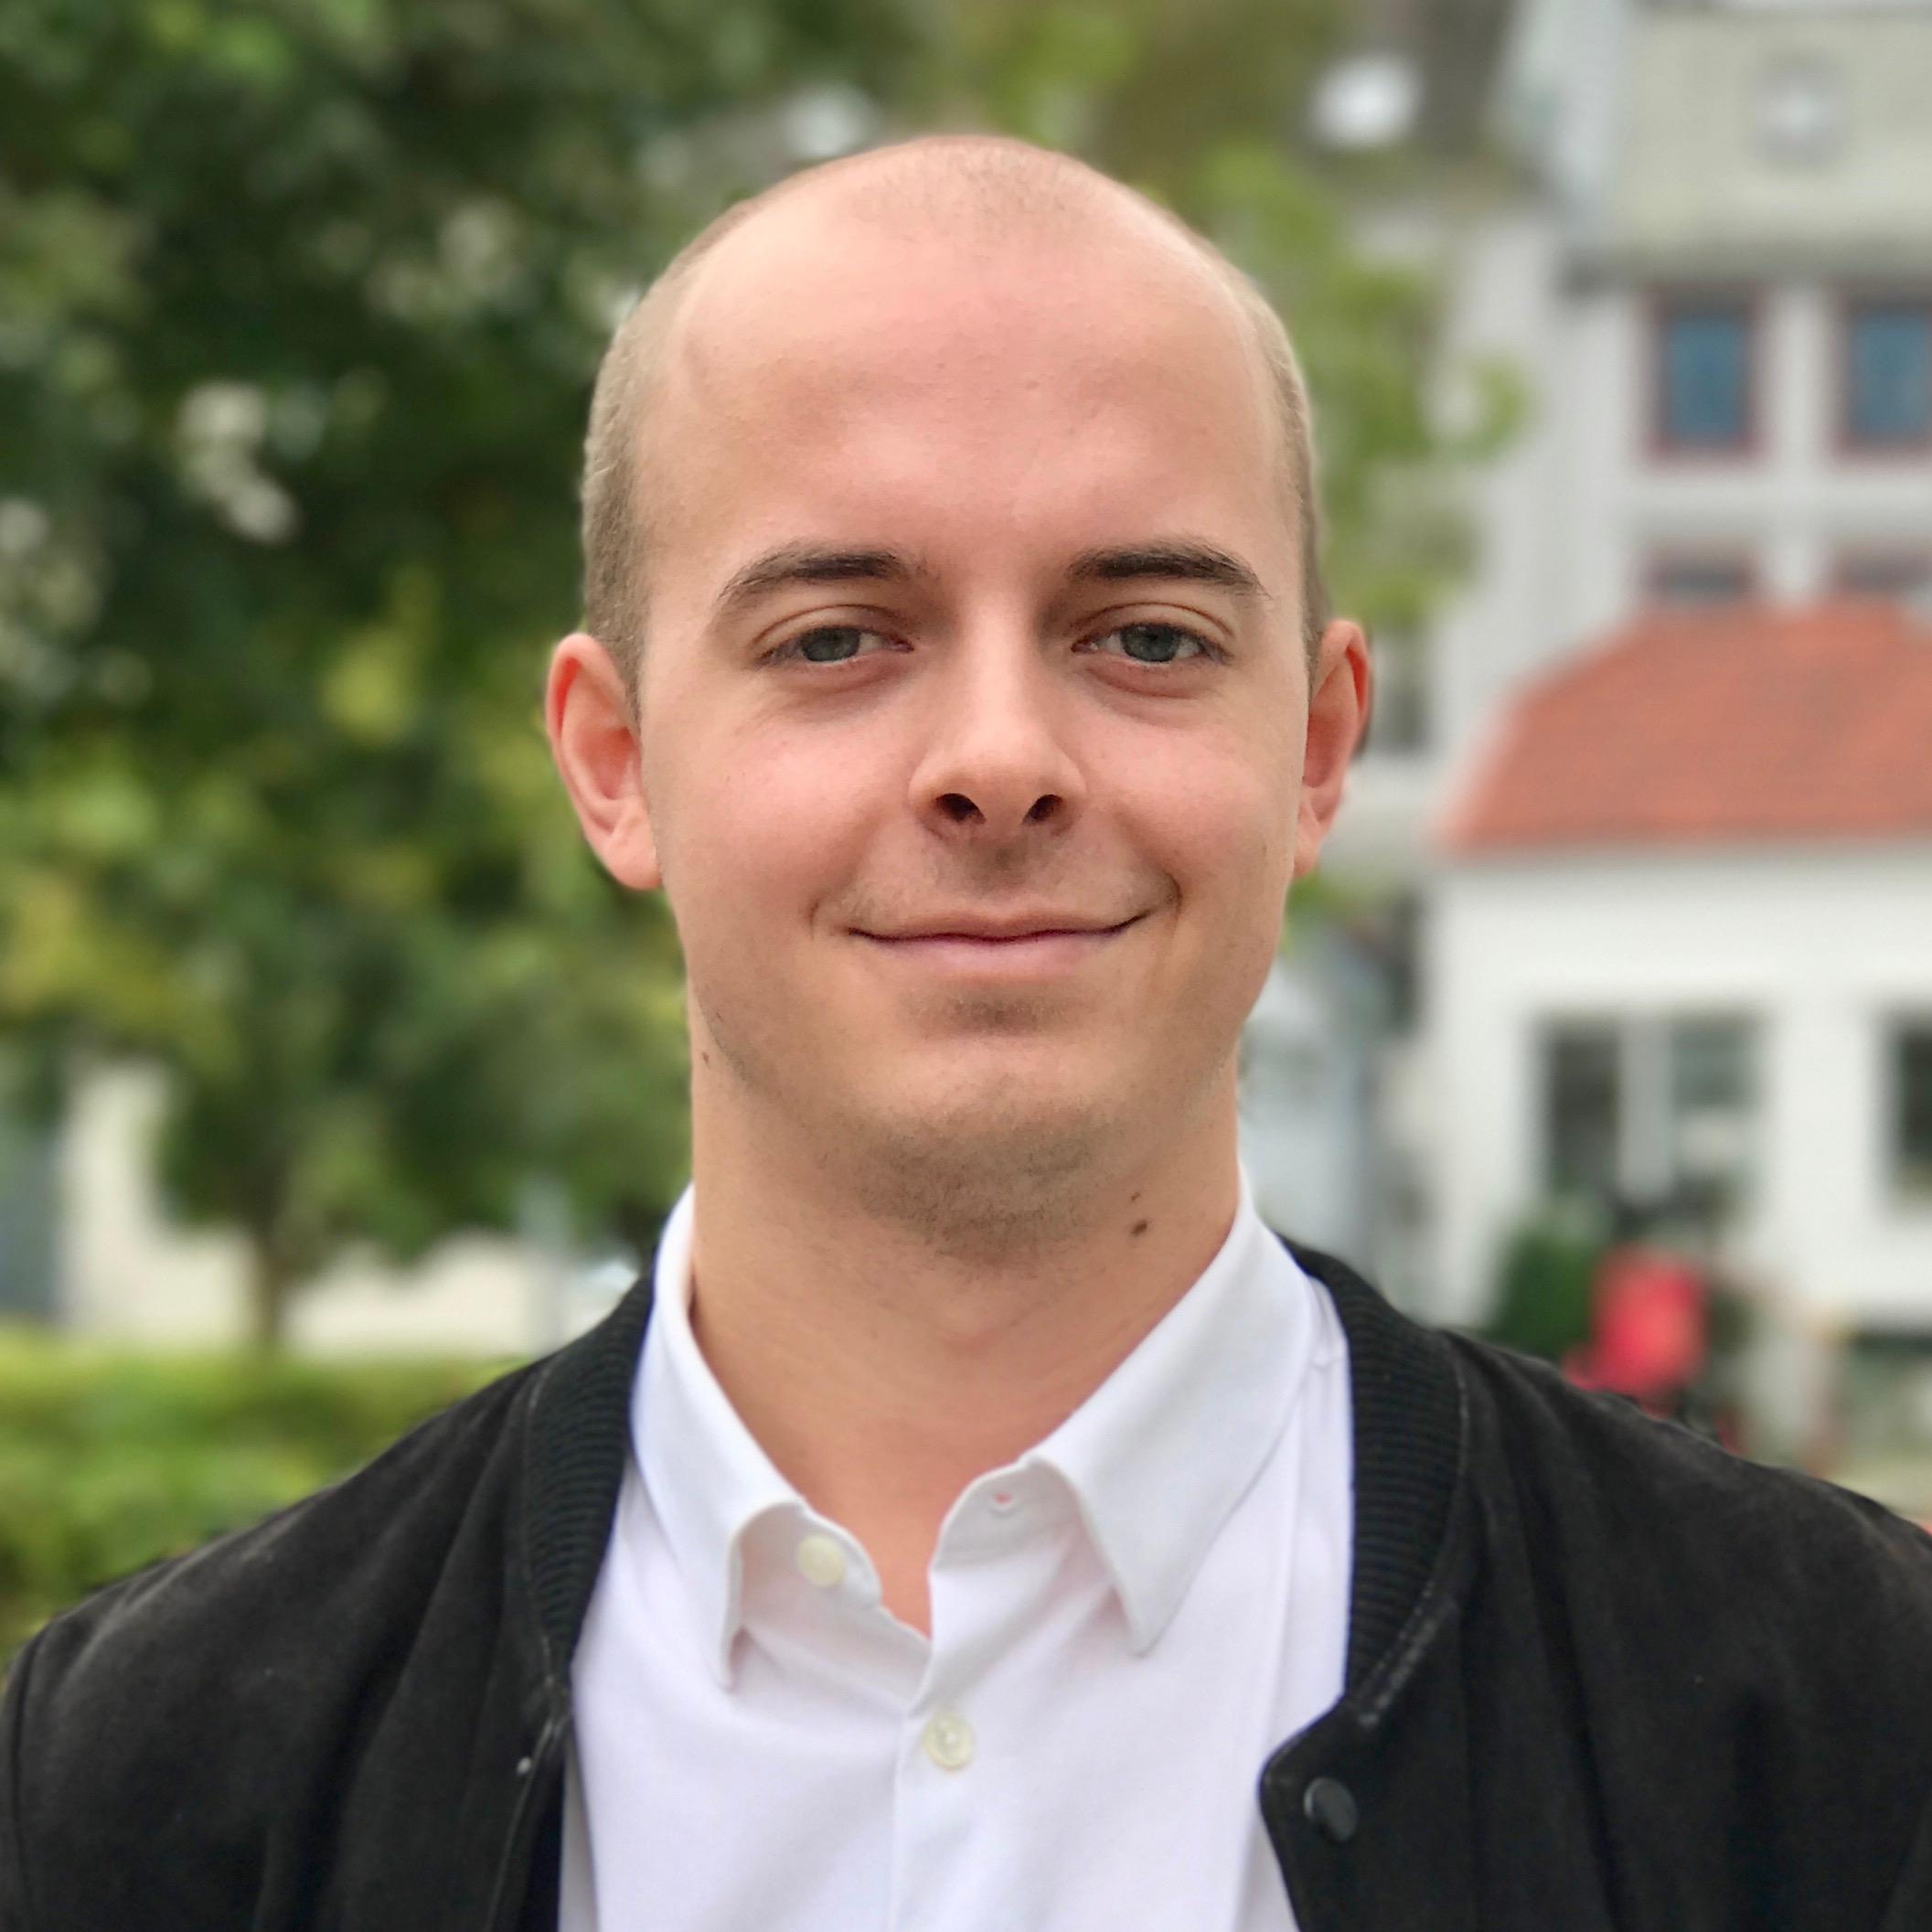 Christer Hansen Eriksen